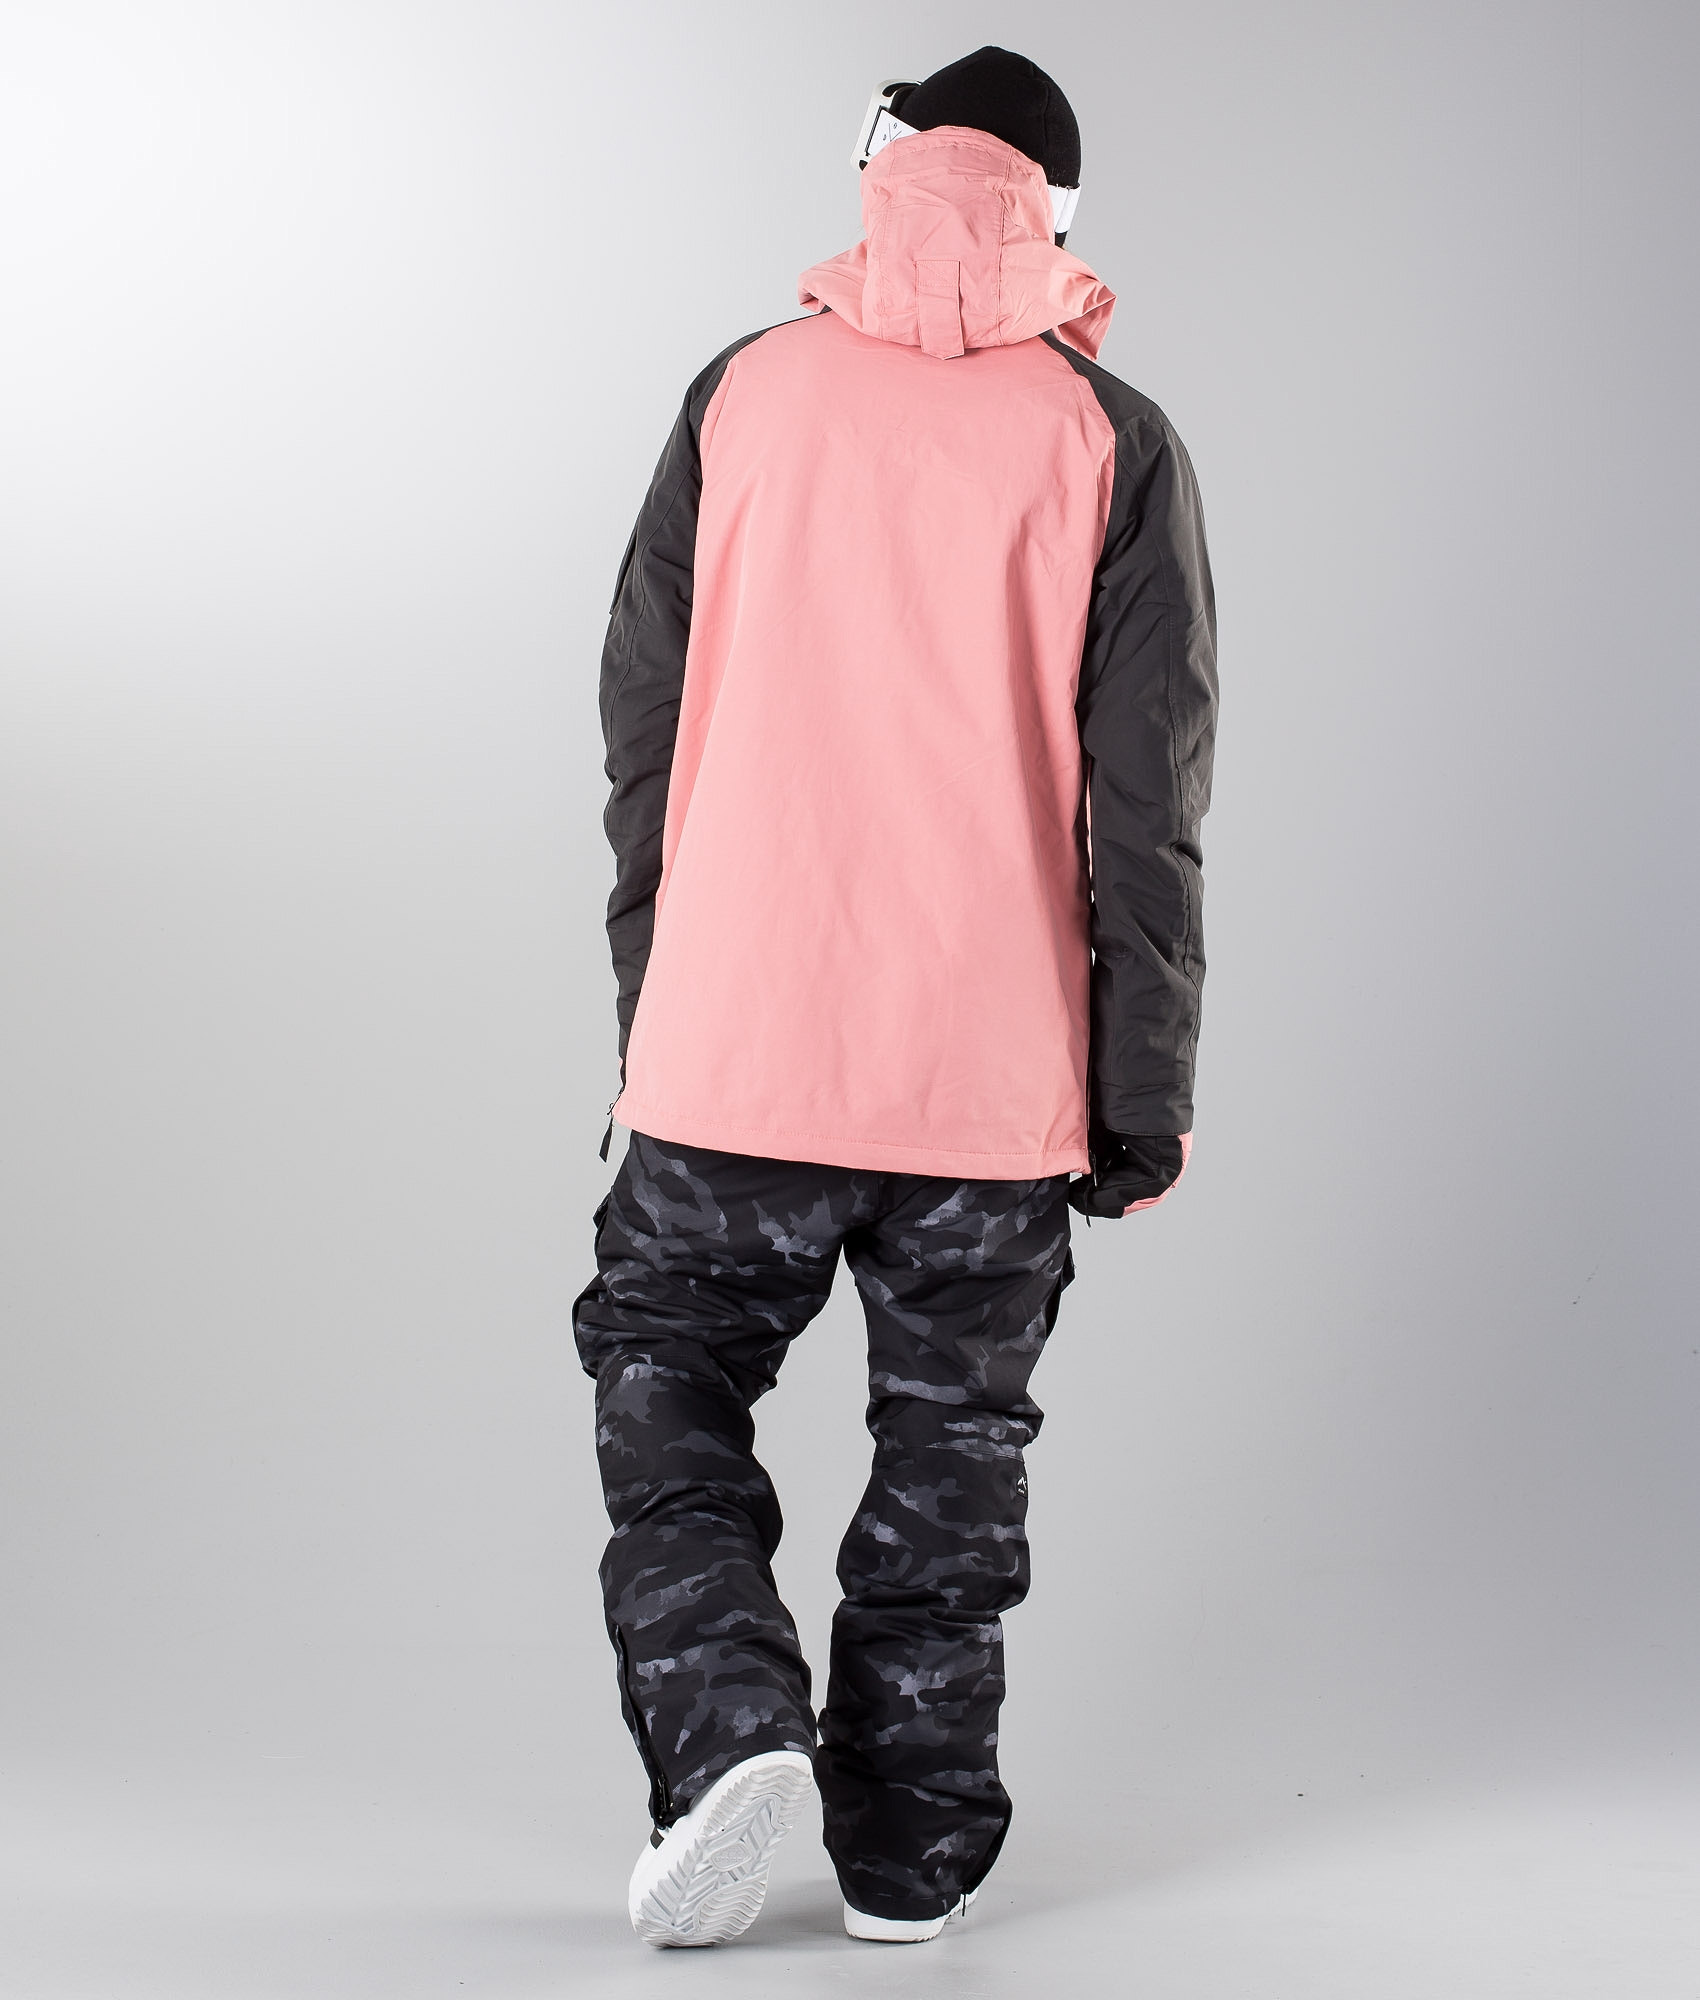 b50b6d878718 Dope Annok Snowboardjacka Dark Grey/Pink - Ridestore.se